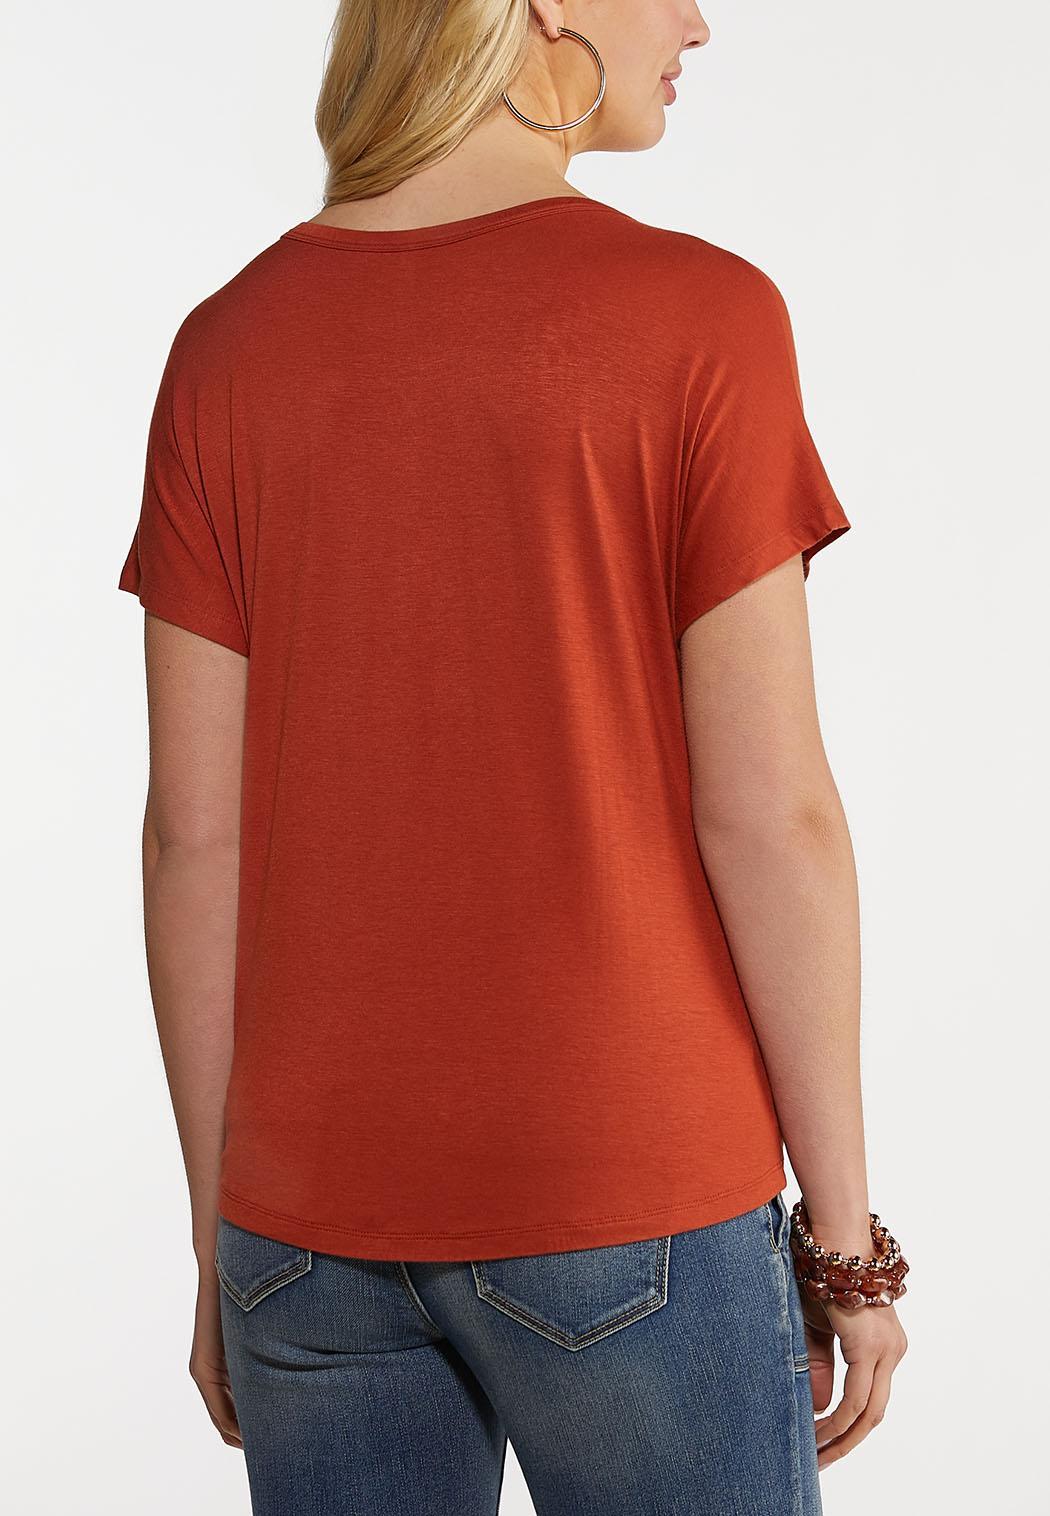 Button Tie Front Top (Item #44156735)